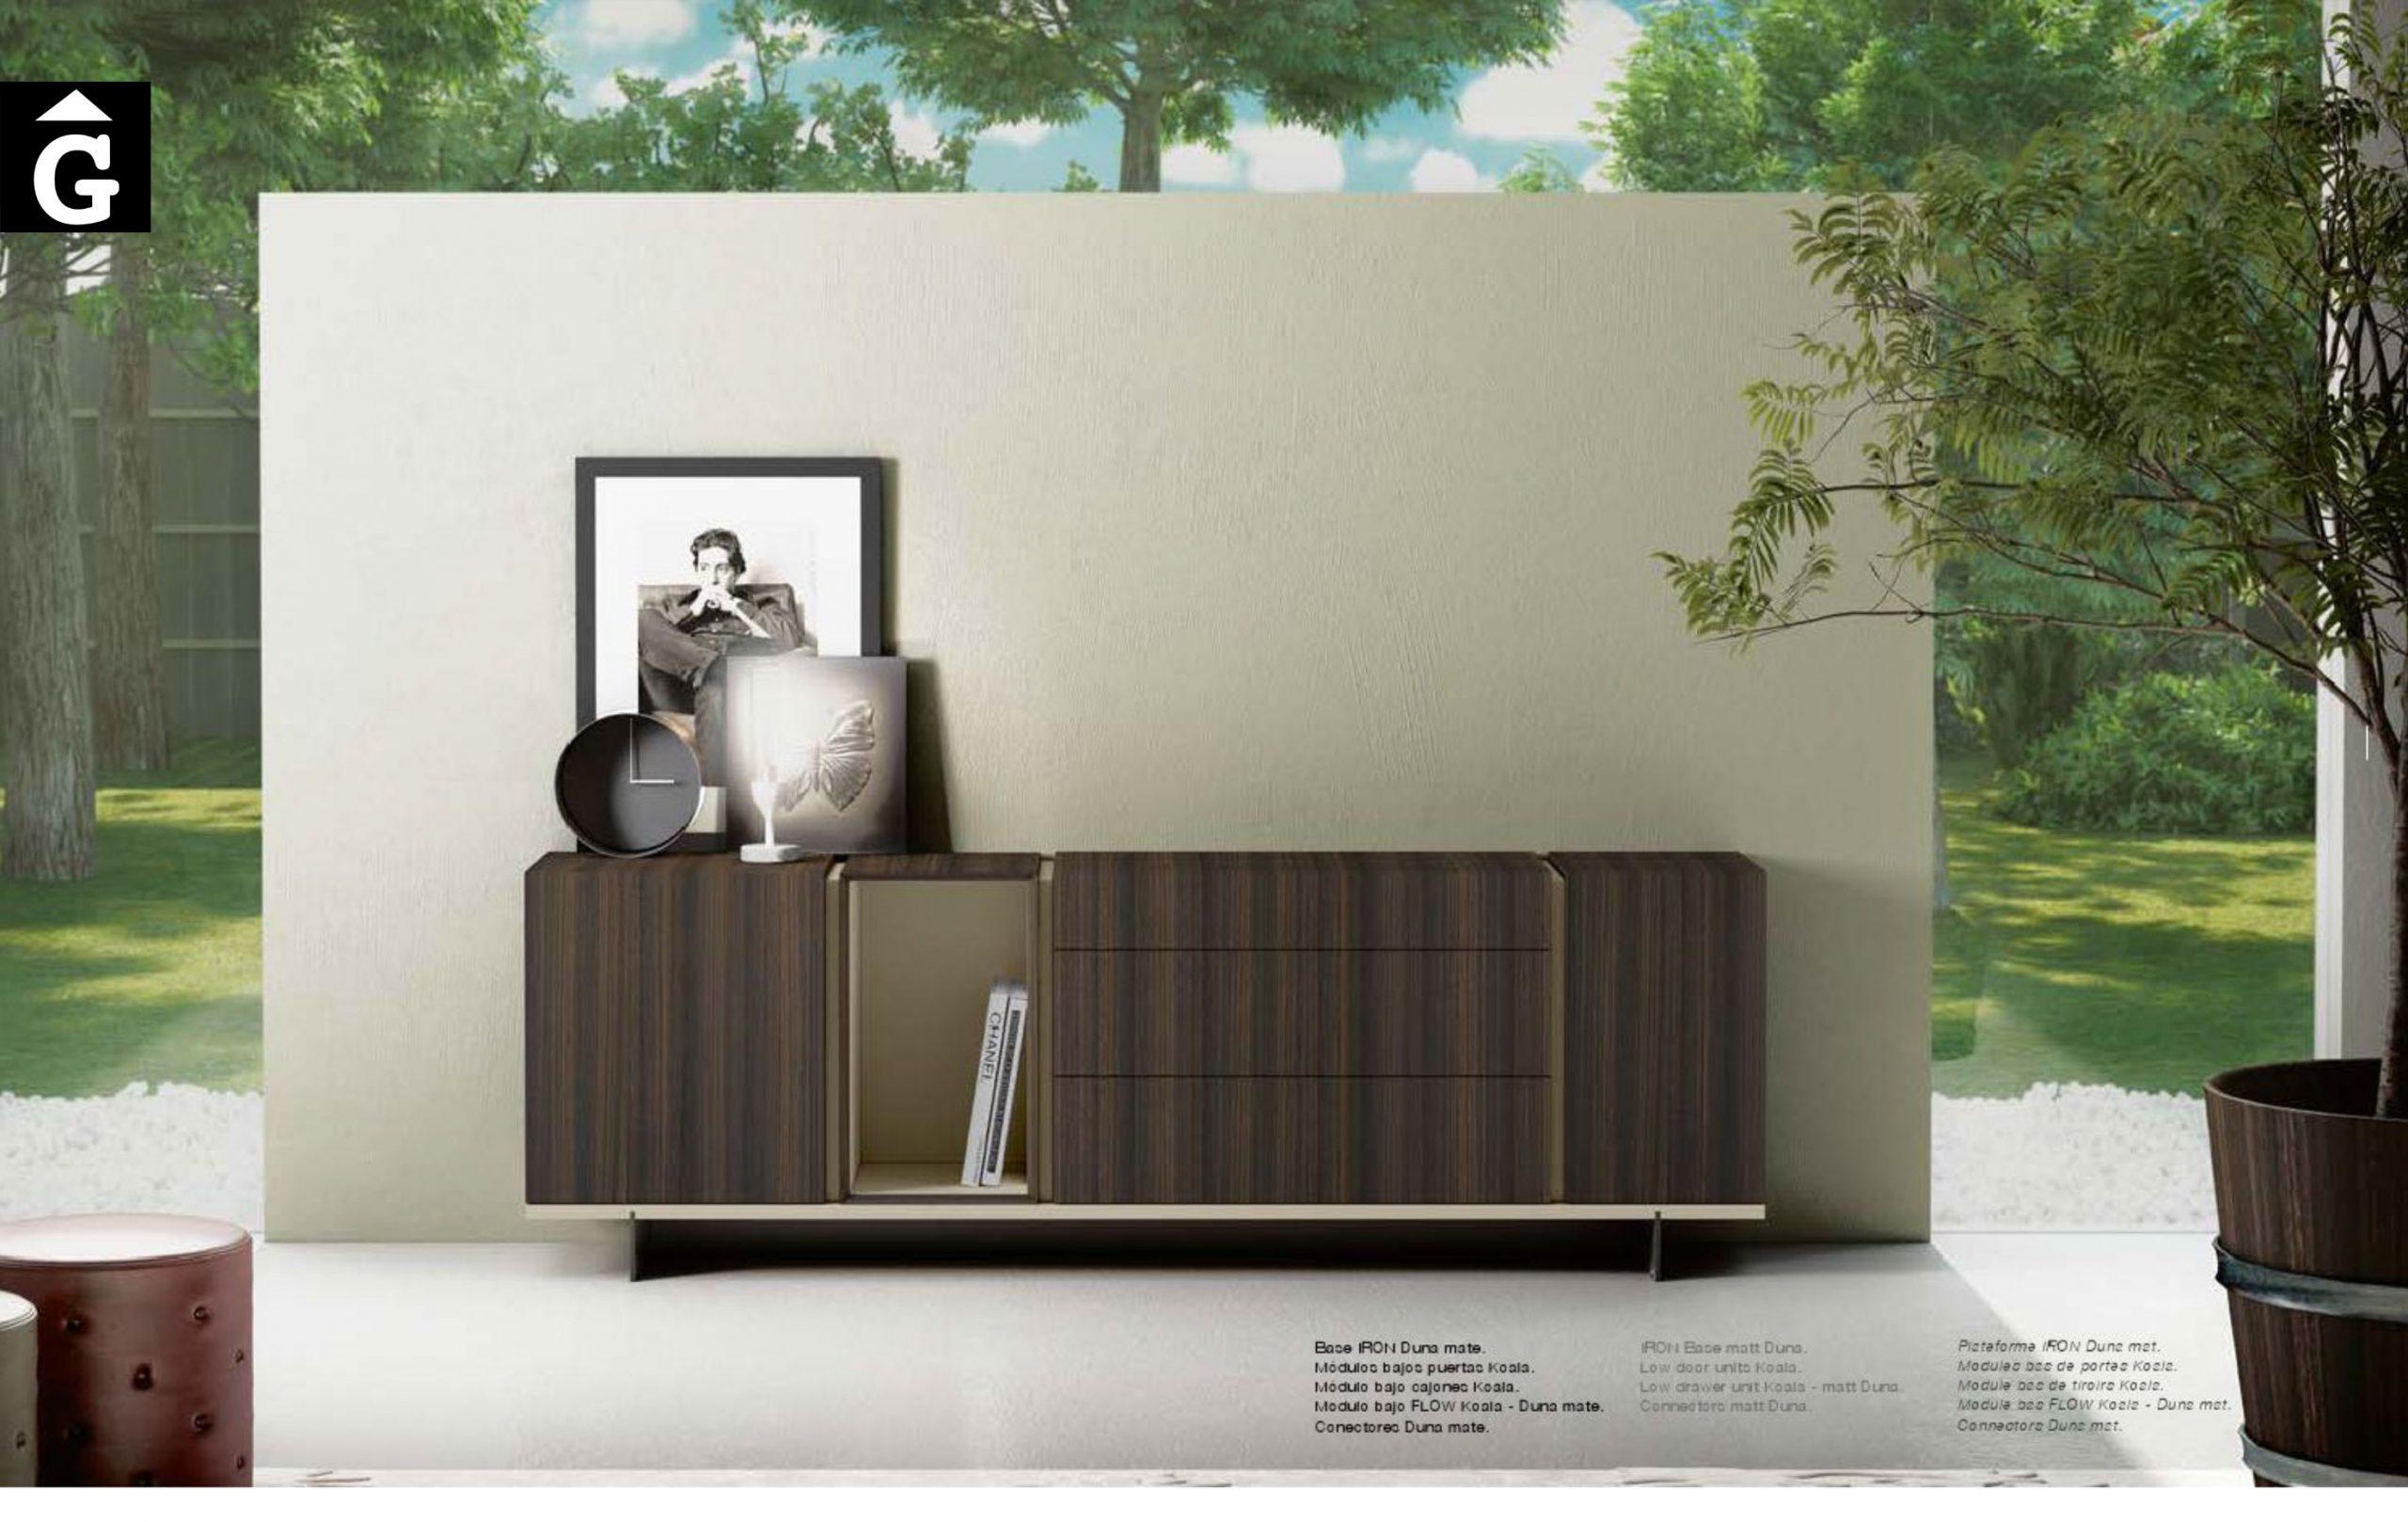 MOBLE-1-CONNECTOR-EMEDE-mobles-by-Mobles-GIFREU-Girona-ESPAI-EMEDE-Epacio-emede-Muebles-MD-moble-menjador-Sala-estar-habitatge-qualitat-laca-xapa-natural